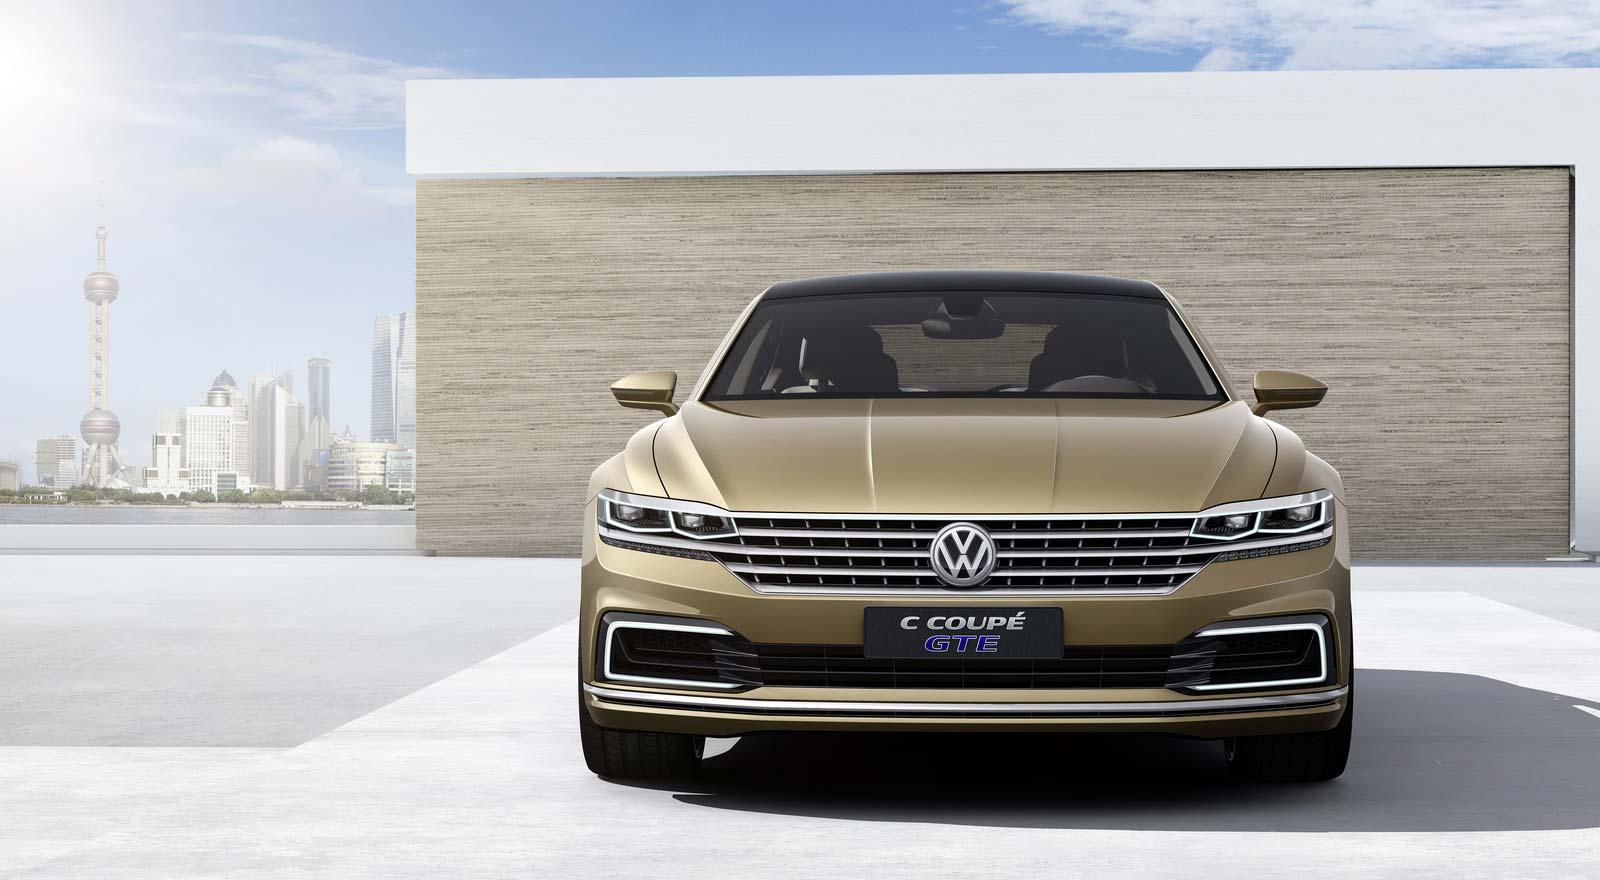 Новый Volkswagen C Coupe GTE